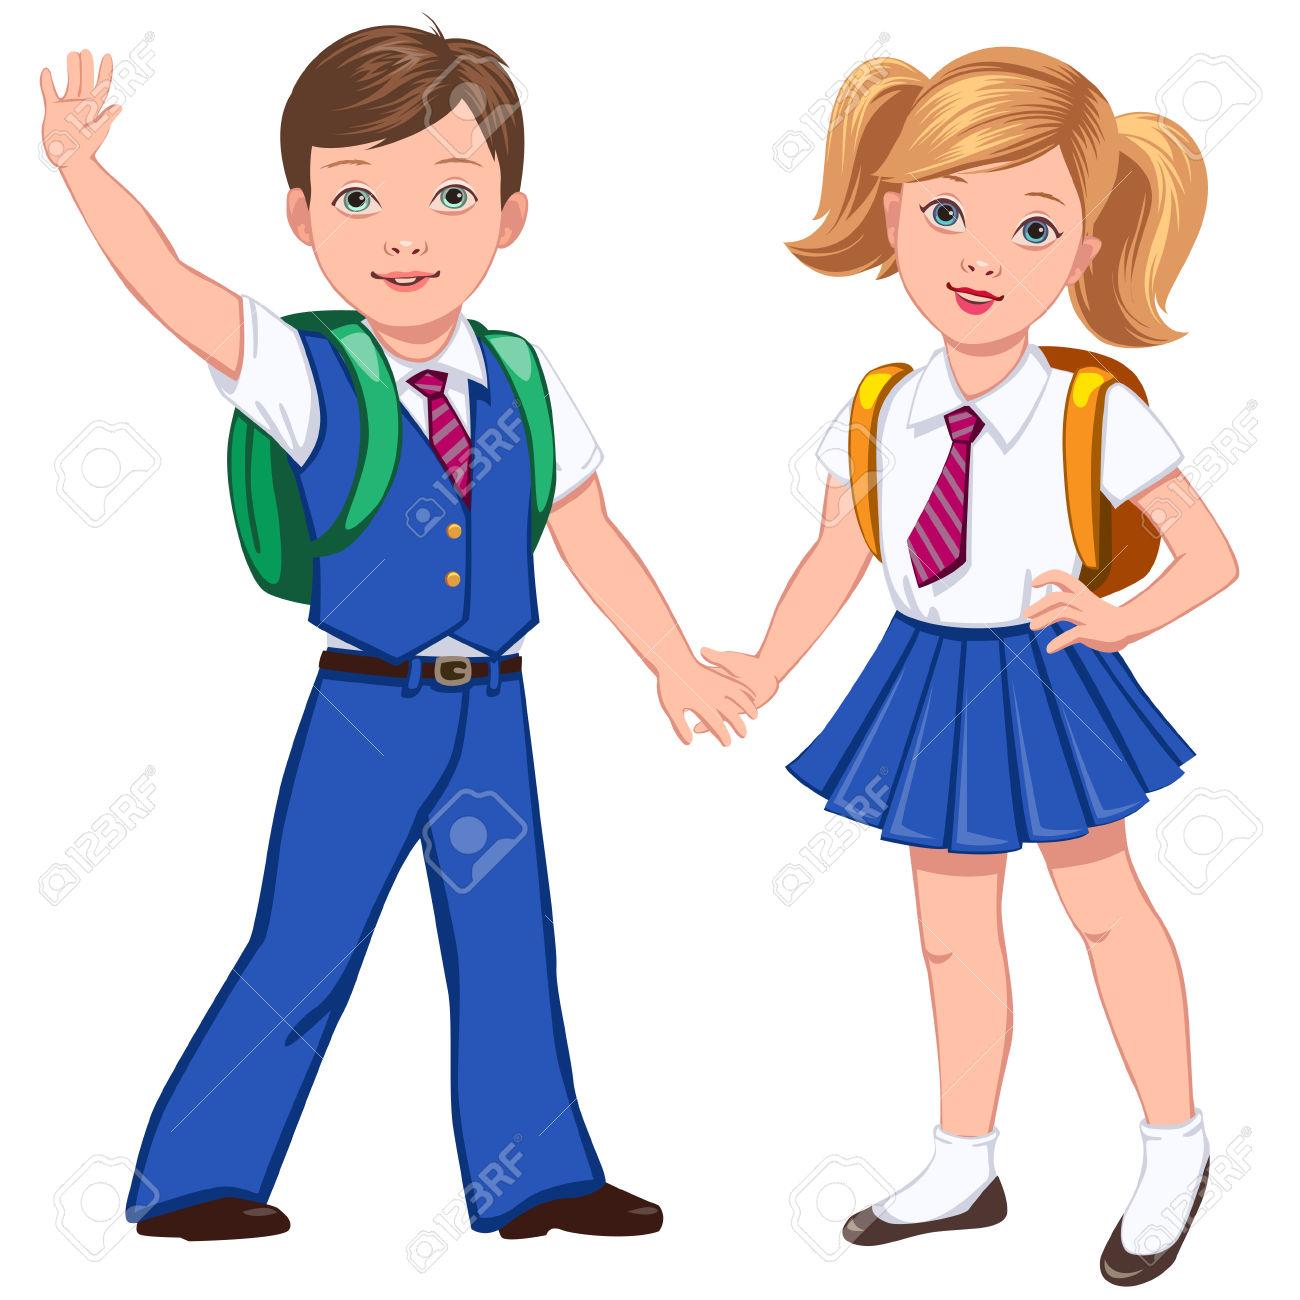 3,457 School Children In Uniform Stock Vector Illustration And.